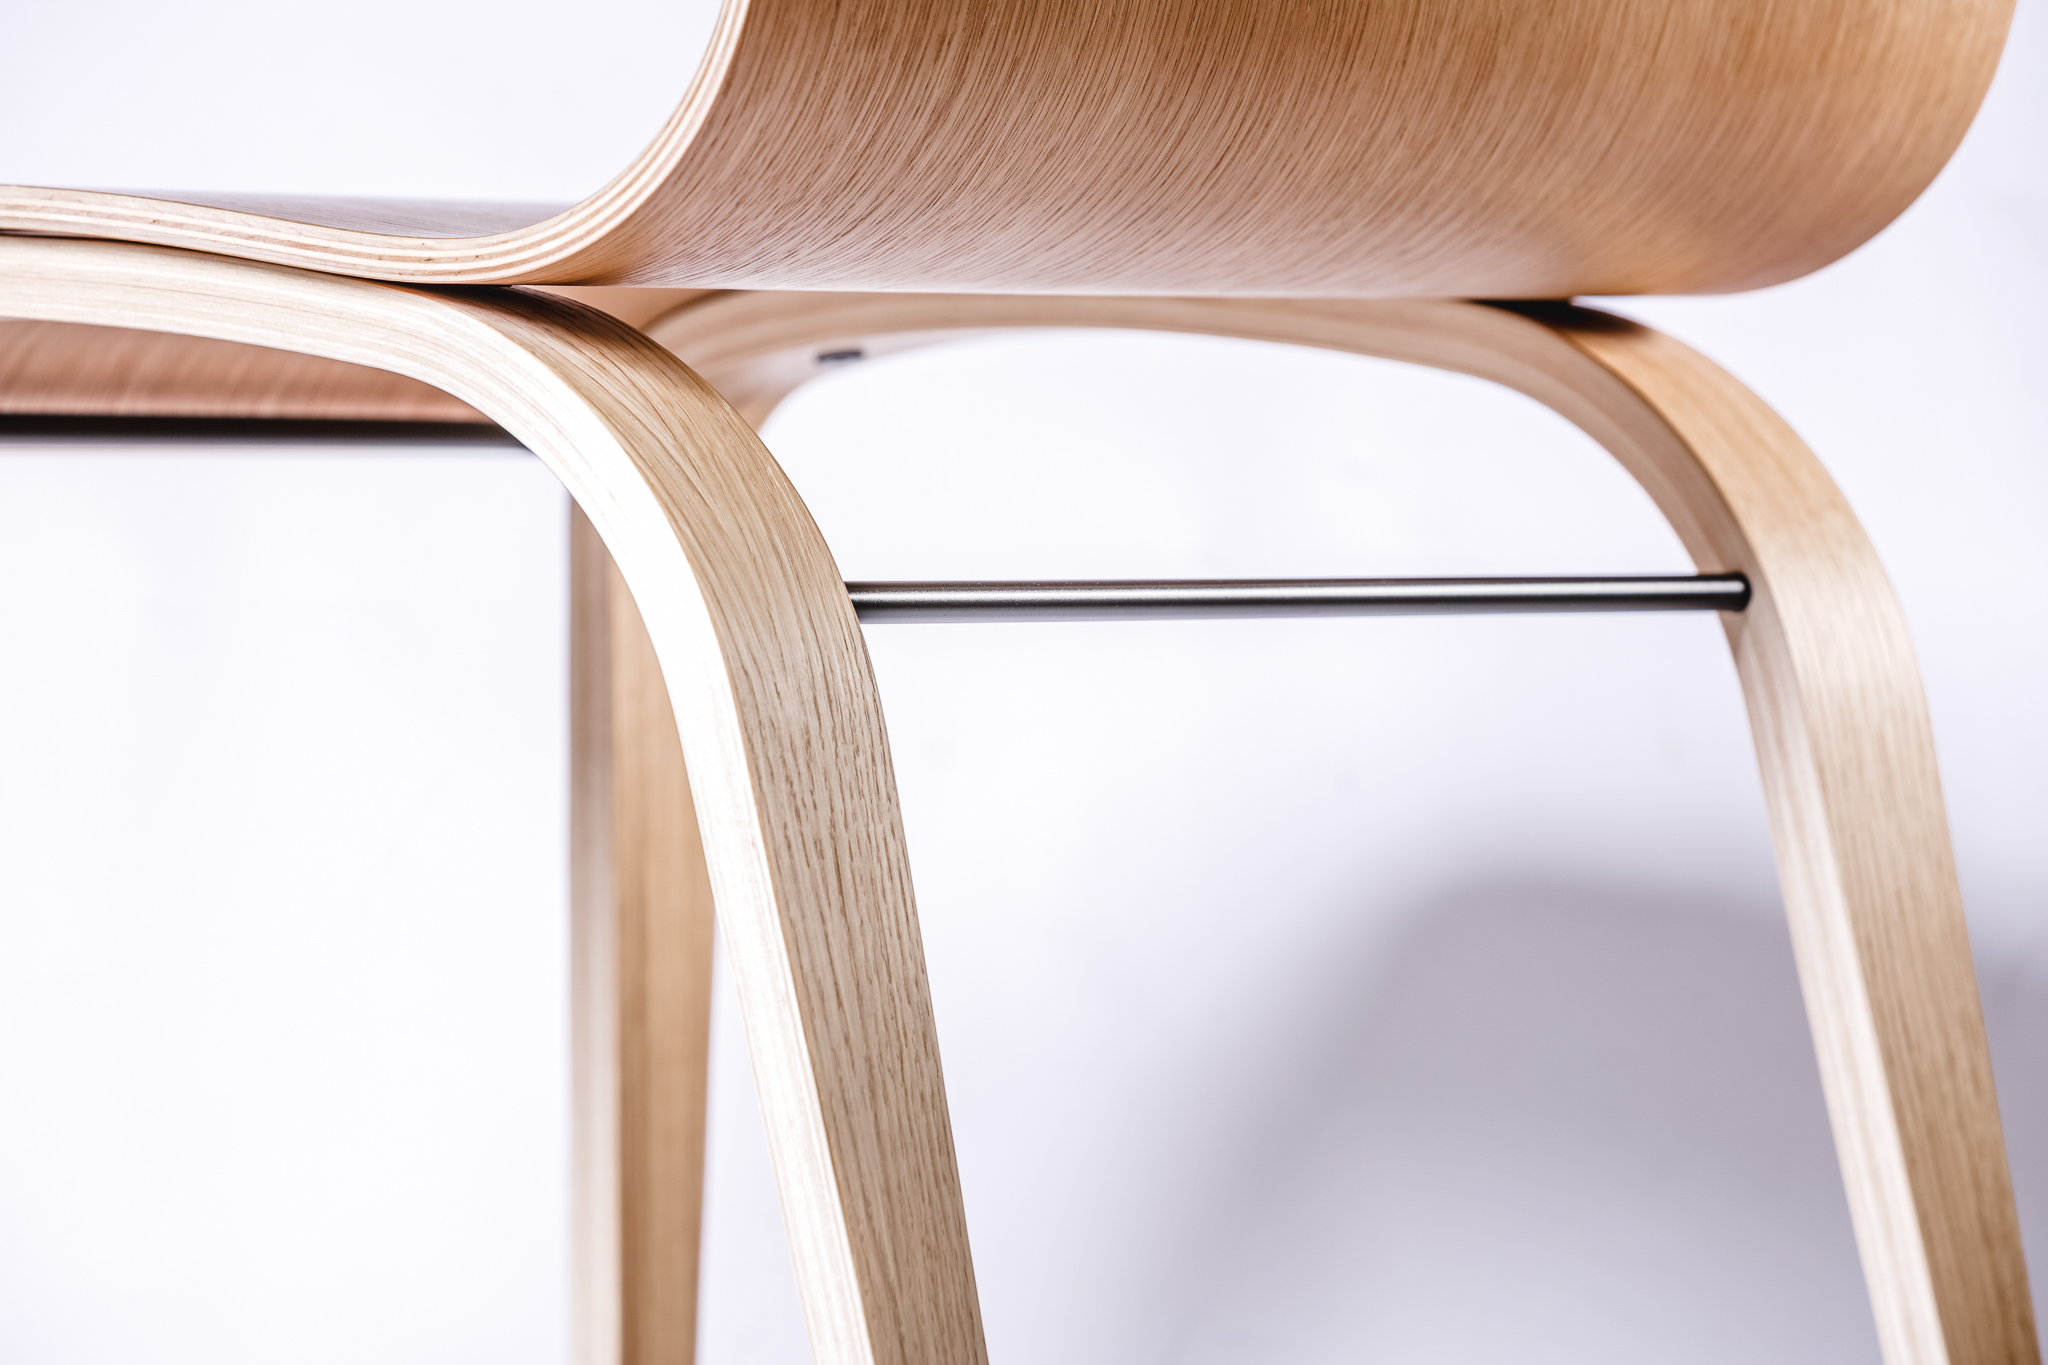 Dižozols bent wood design chairs (8)